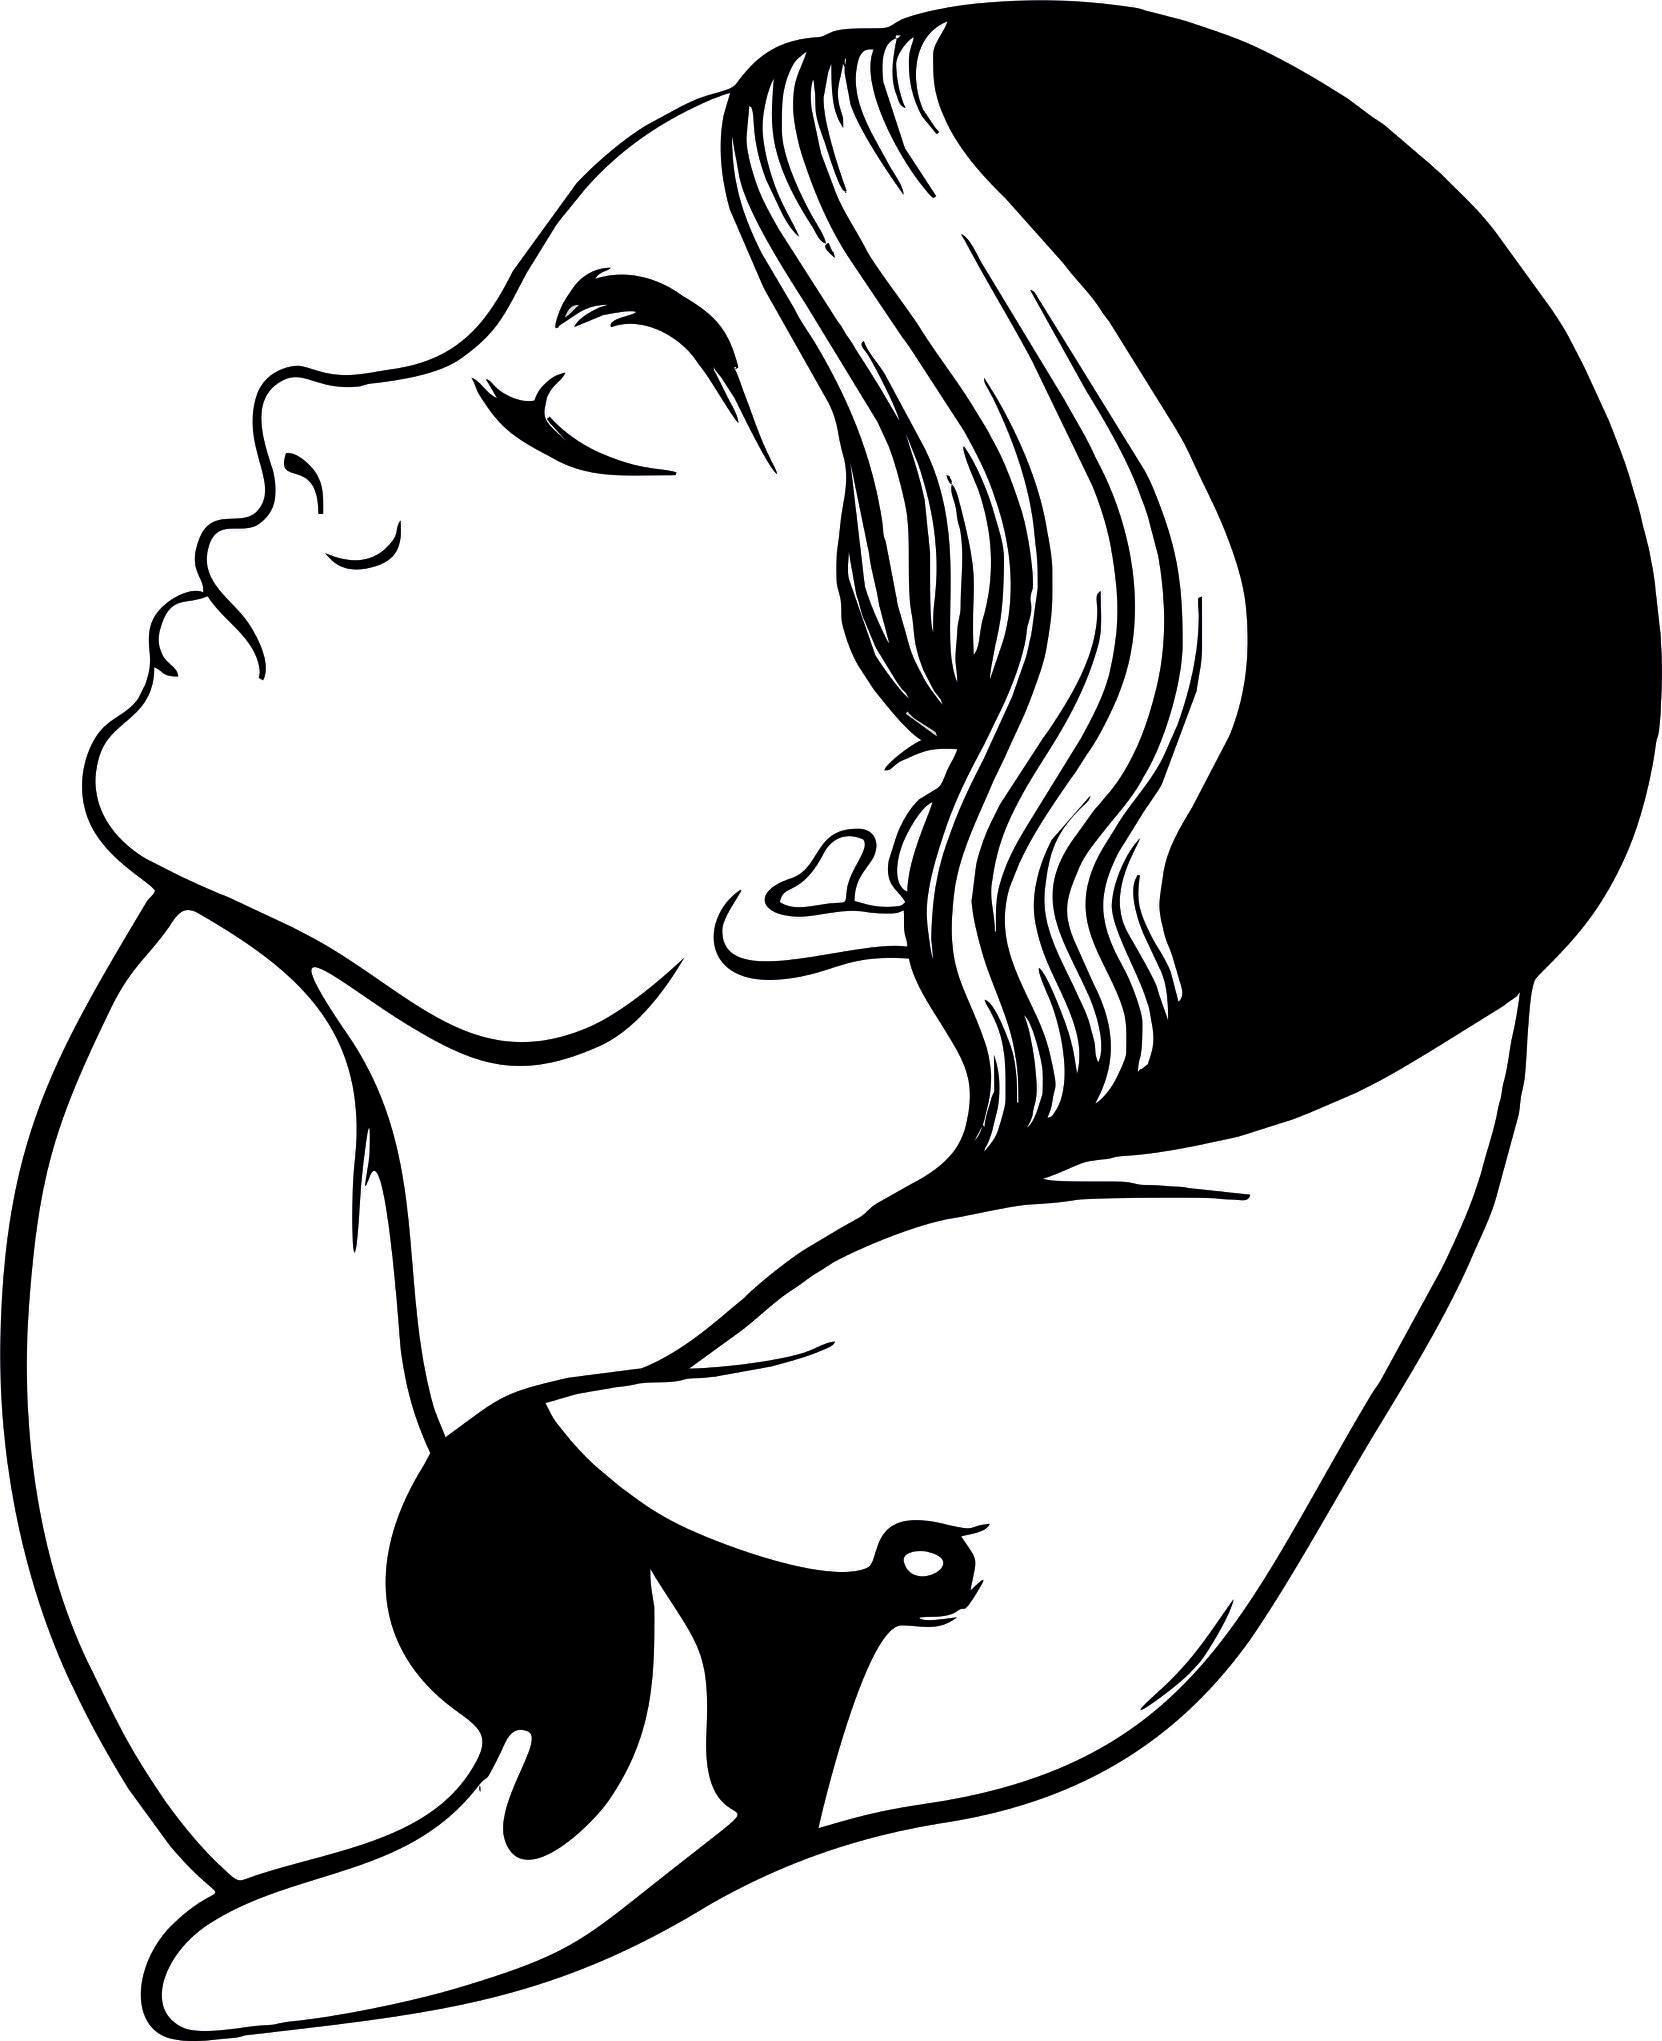 1662x2041 Beauty Women Face Vector Art Jpg Image Free Download